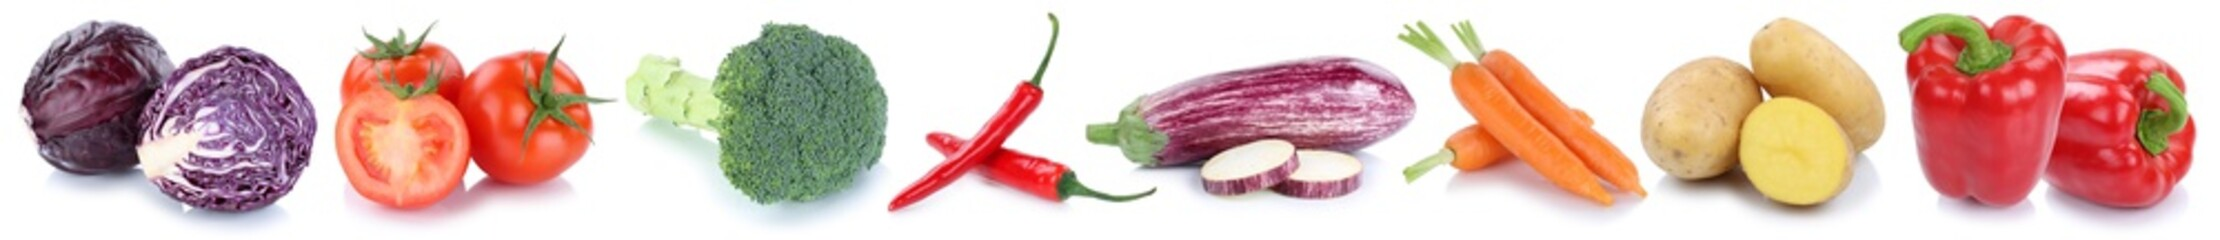 Keuken foto achterwand Verse groenten Gemüse Kartoffeln Karotten frische Tomaten Freisteller freigest